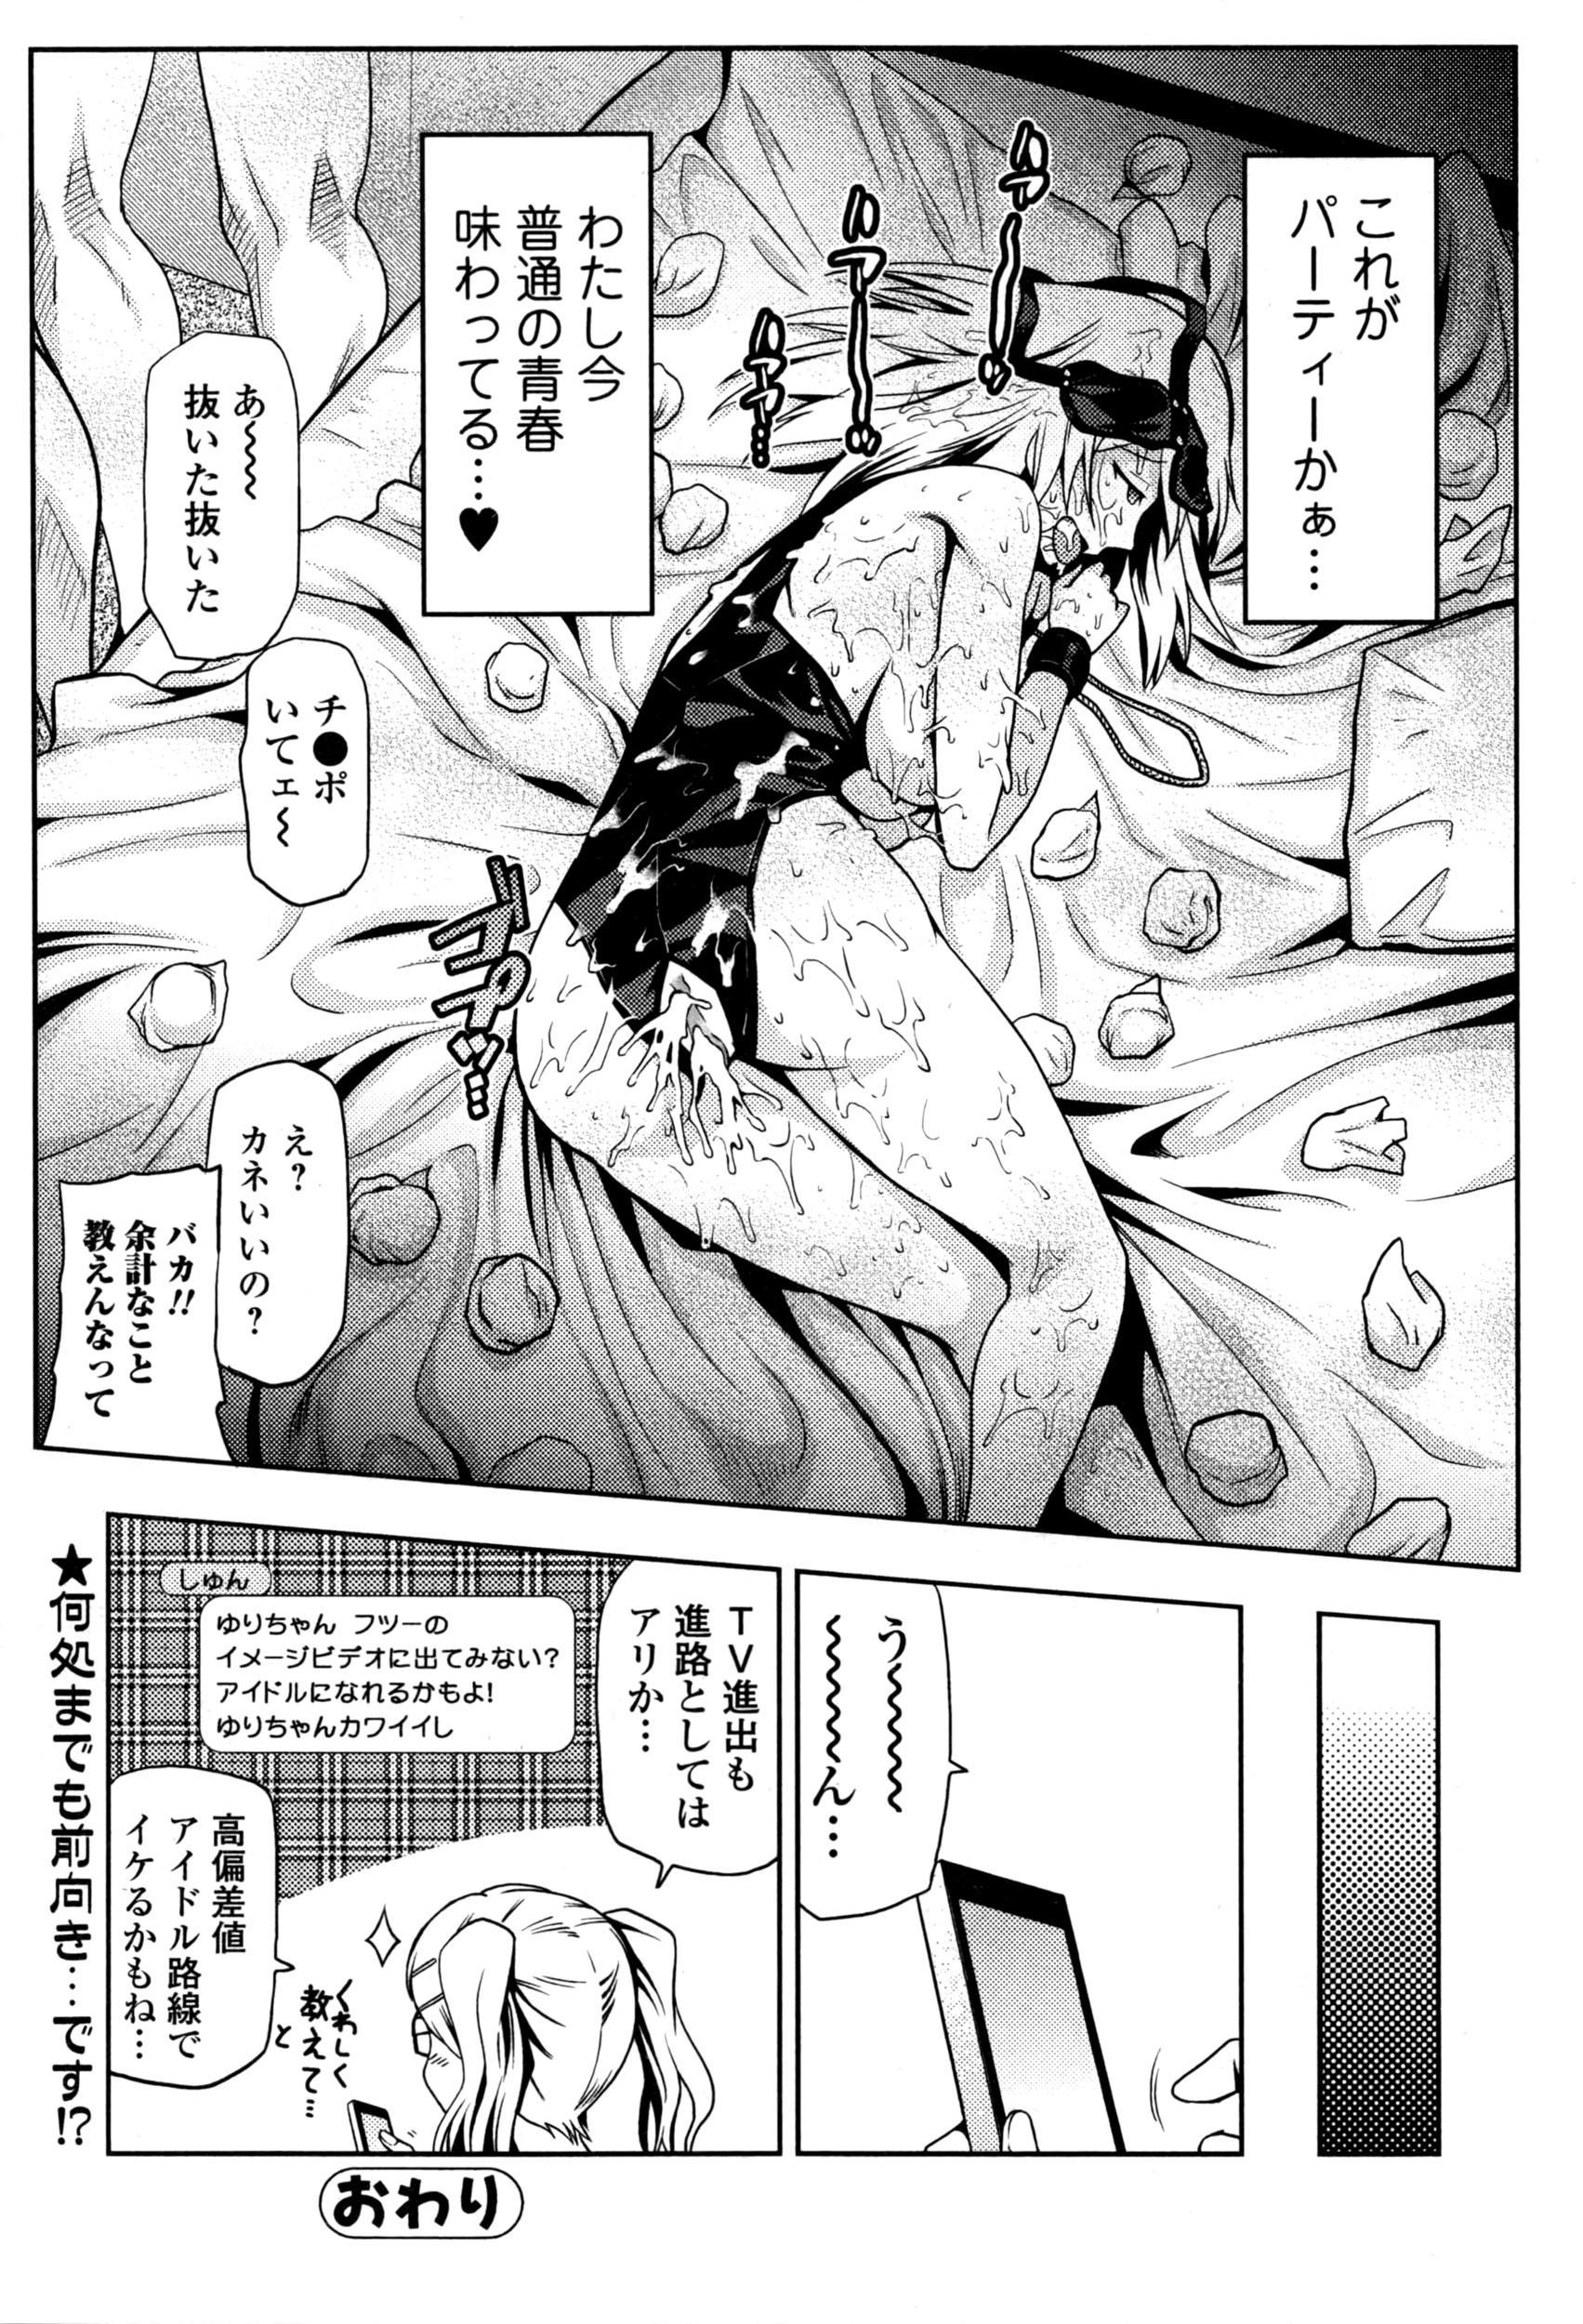 Comic JSCK Vol.3 2016-03 154